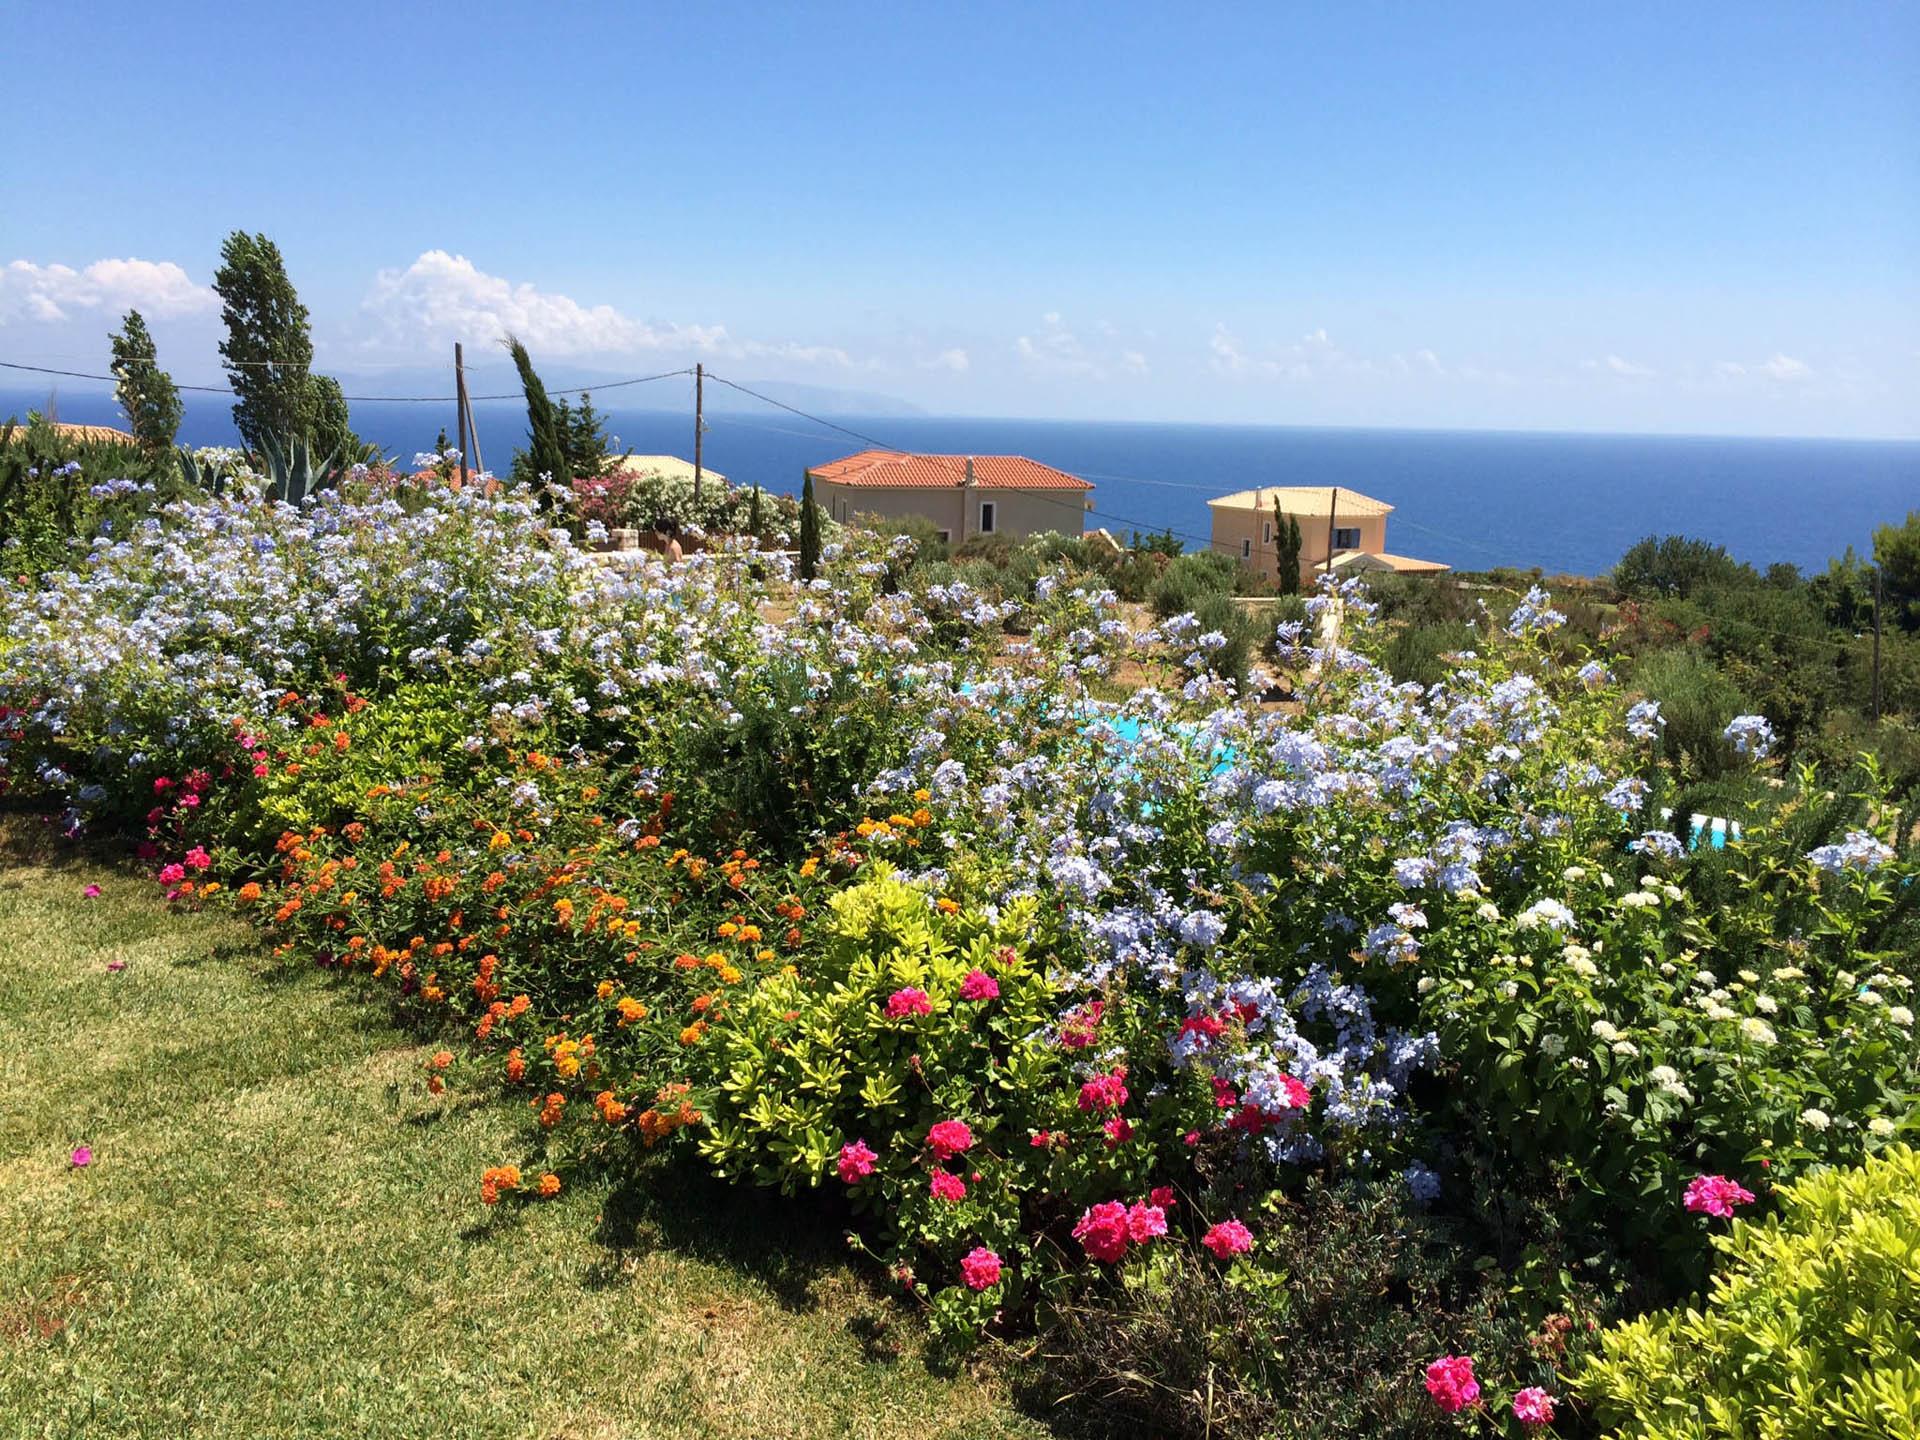 Bellamoli giardini giardini mediterranei - Giardini mediterranei ...